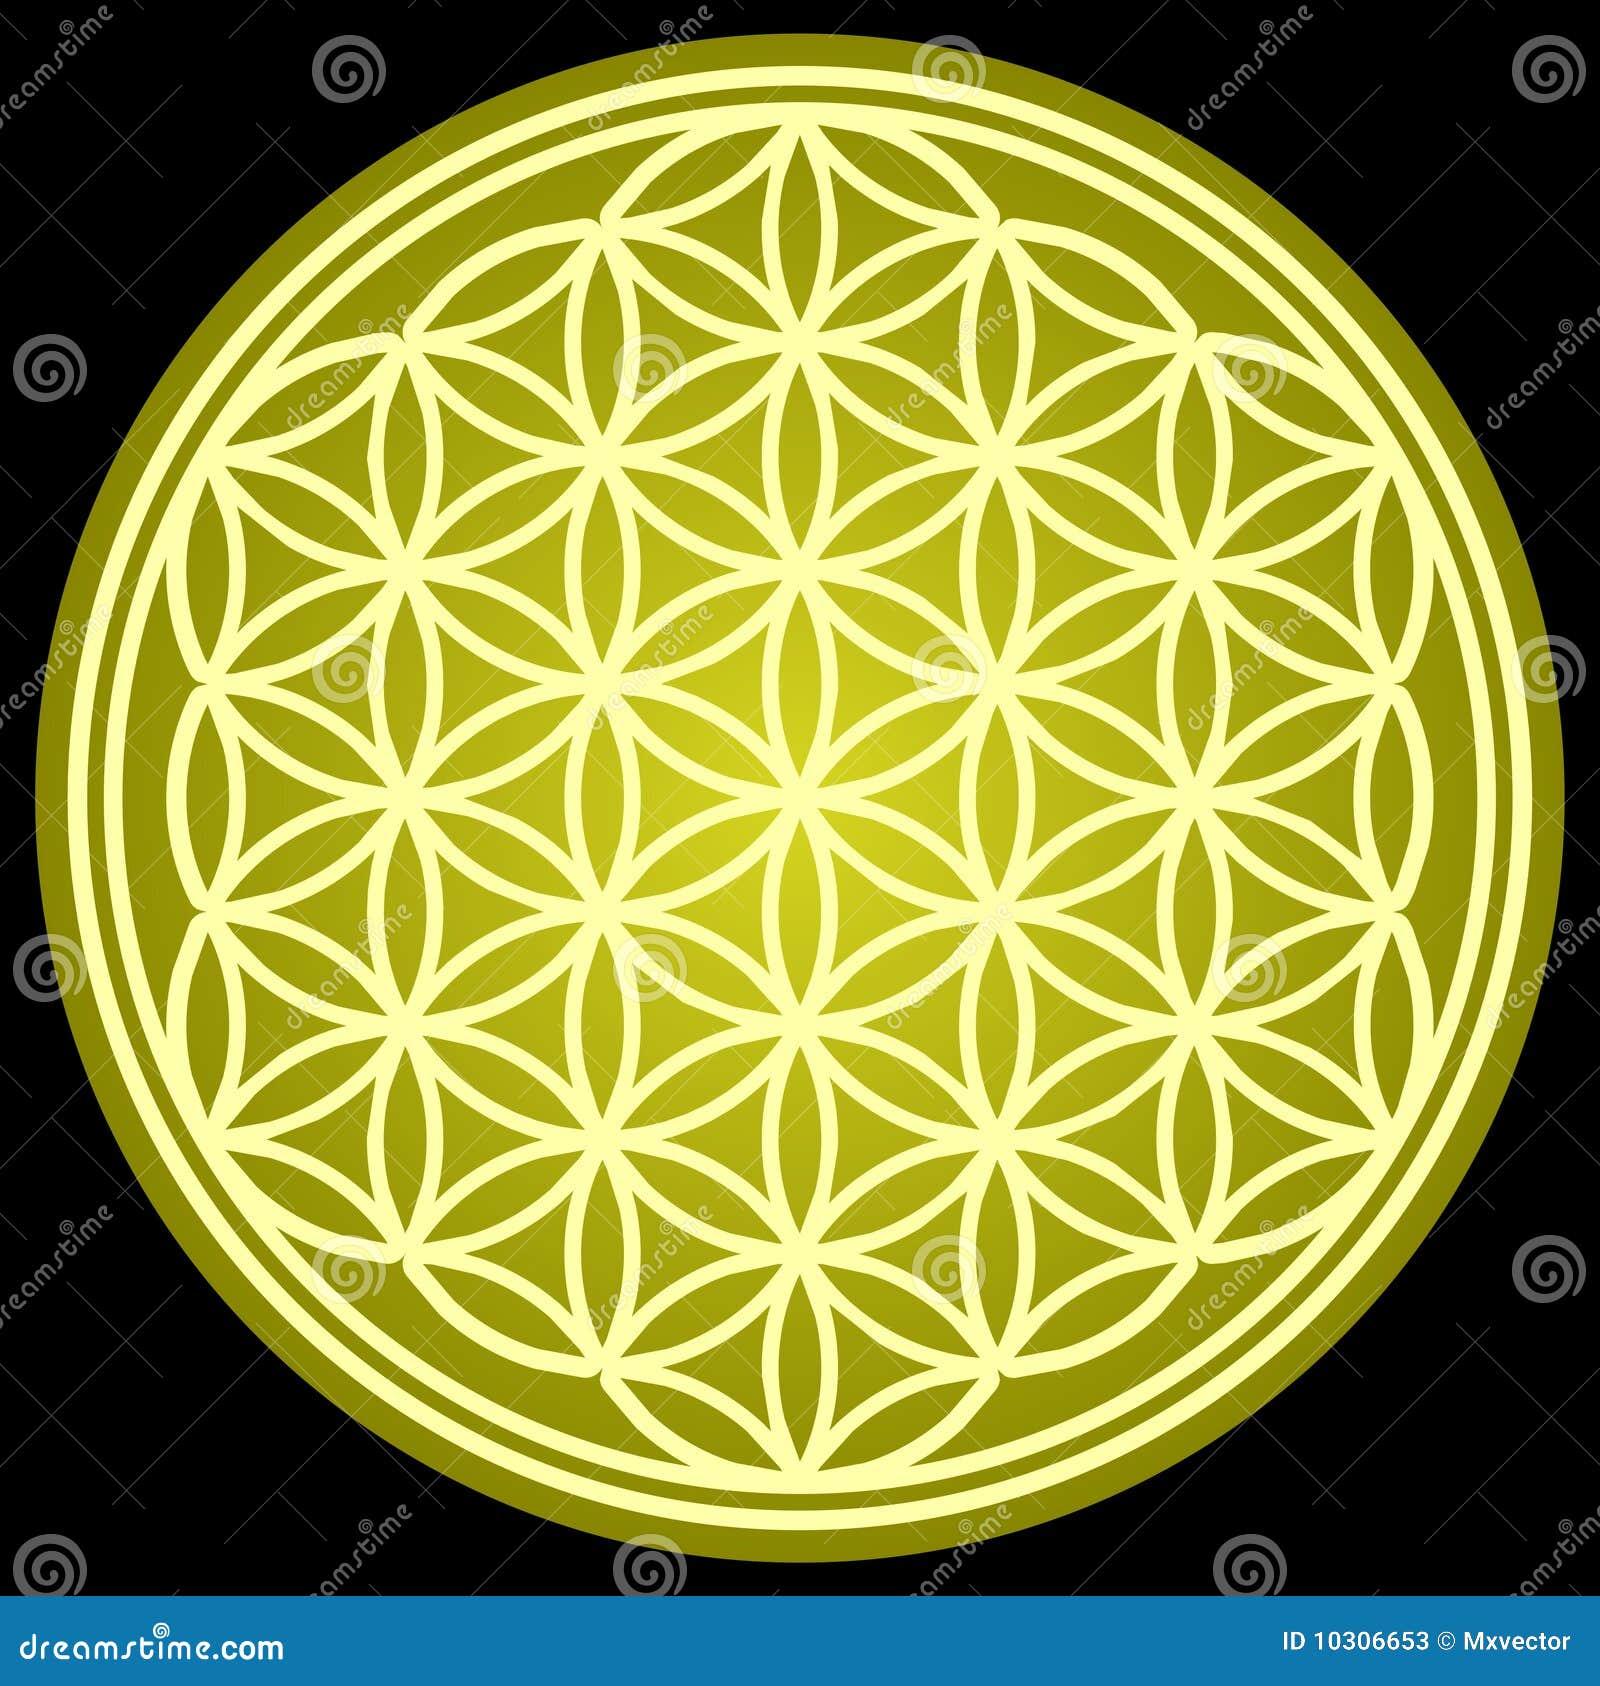 Flower Of Life Sacred Geometry Stock Vector Illustration Of